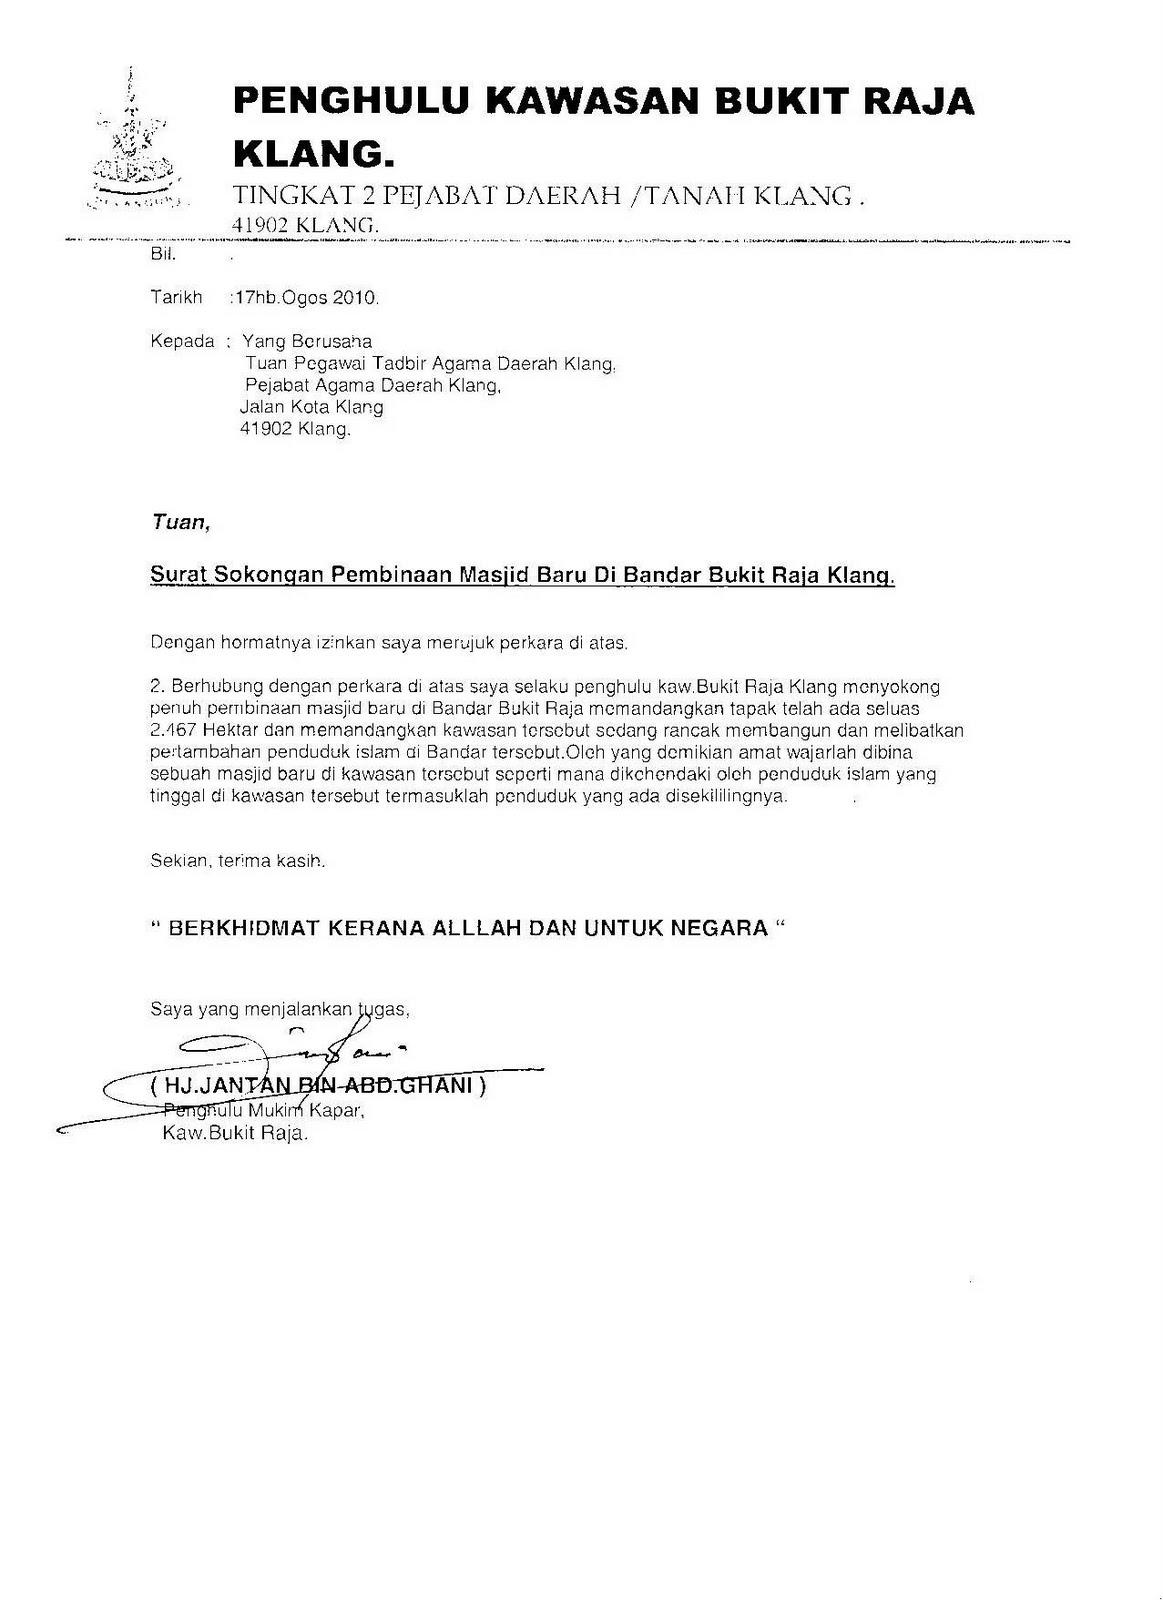 Contoh Proposal Pengadaan Meubeleir Sekolah Download Lengkap